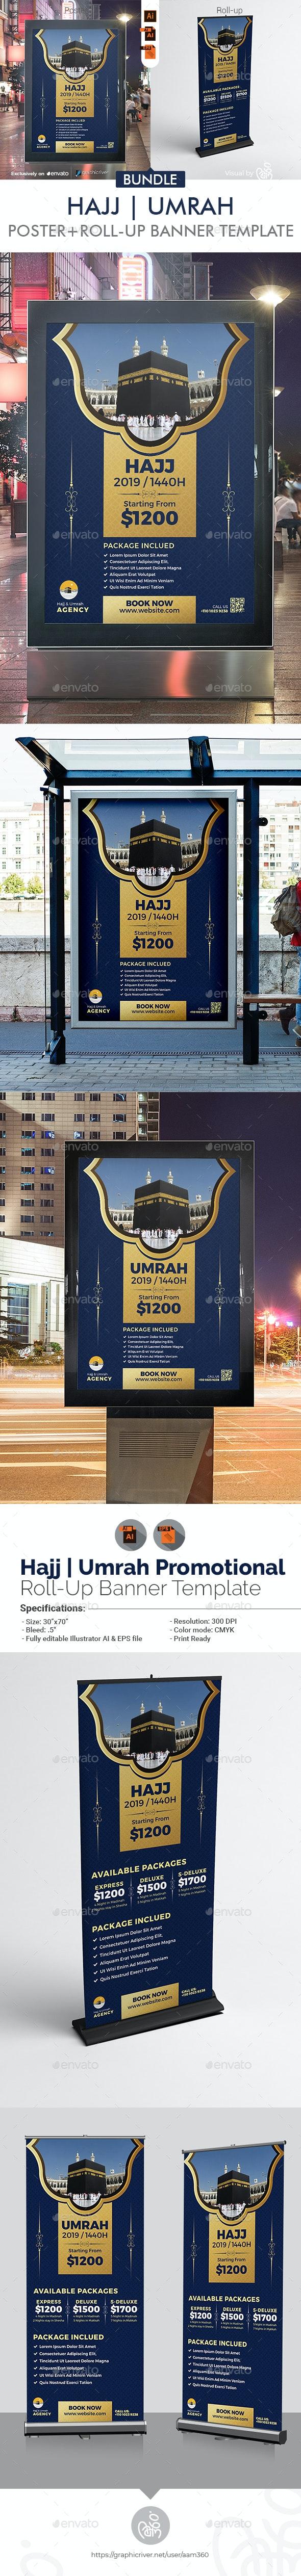 Hajj & Umrah Poster with Rollup Banner Bundle - Signage Print Templates